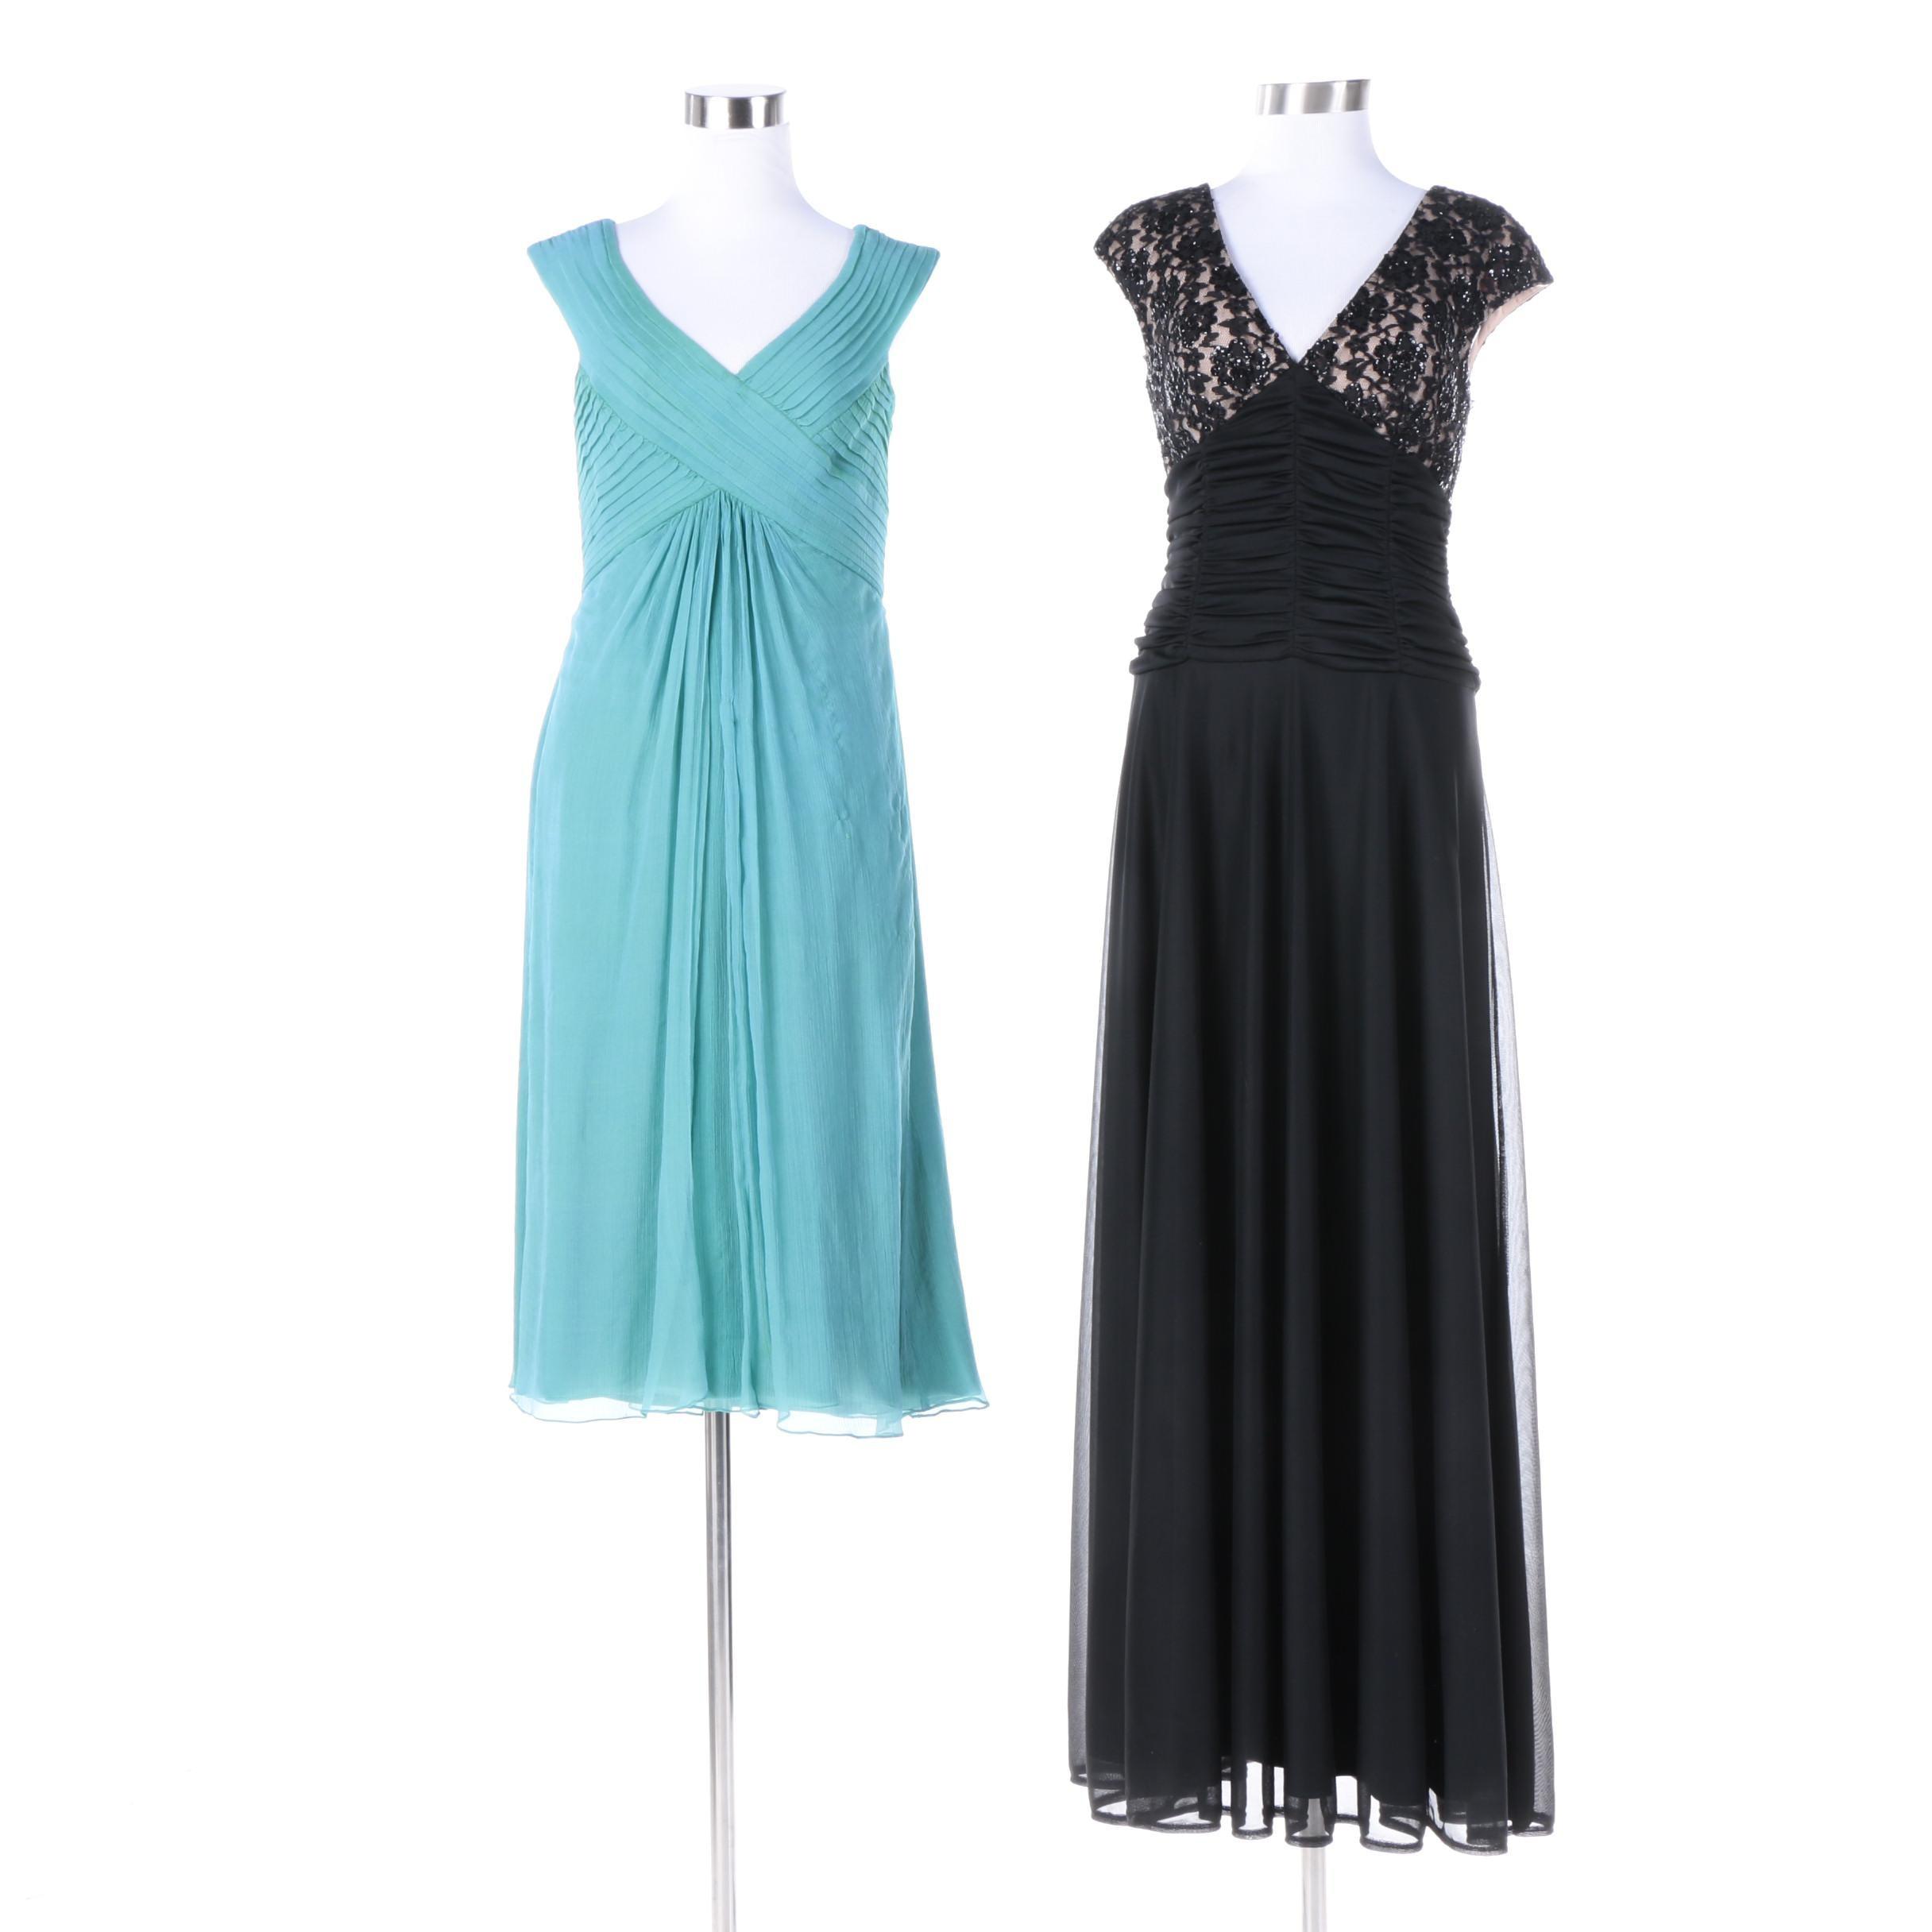 Tadashi Shoji Sleeveless Cocktail Dress and Chadwick's Sleeveless Evening Gown